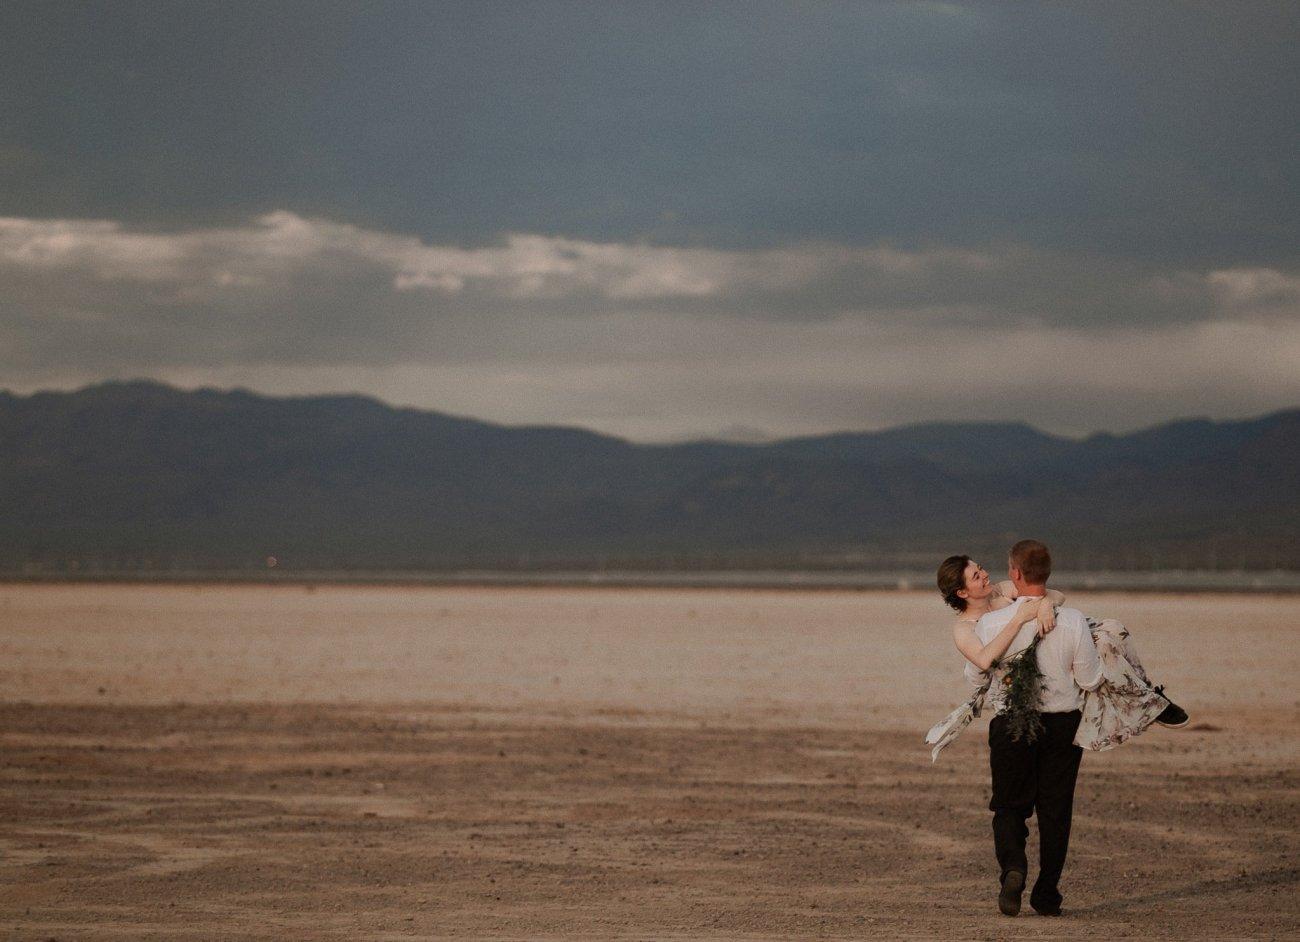 Groom carries bride at Las Vegas Dry Lake Bed at sunrise